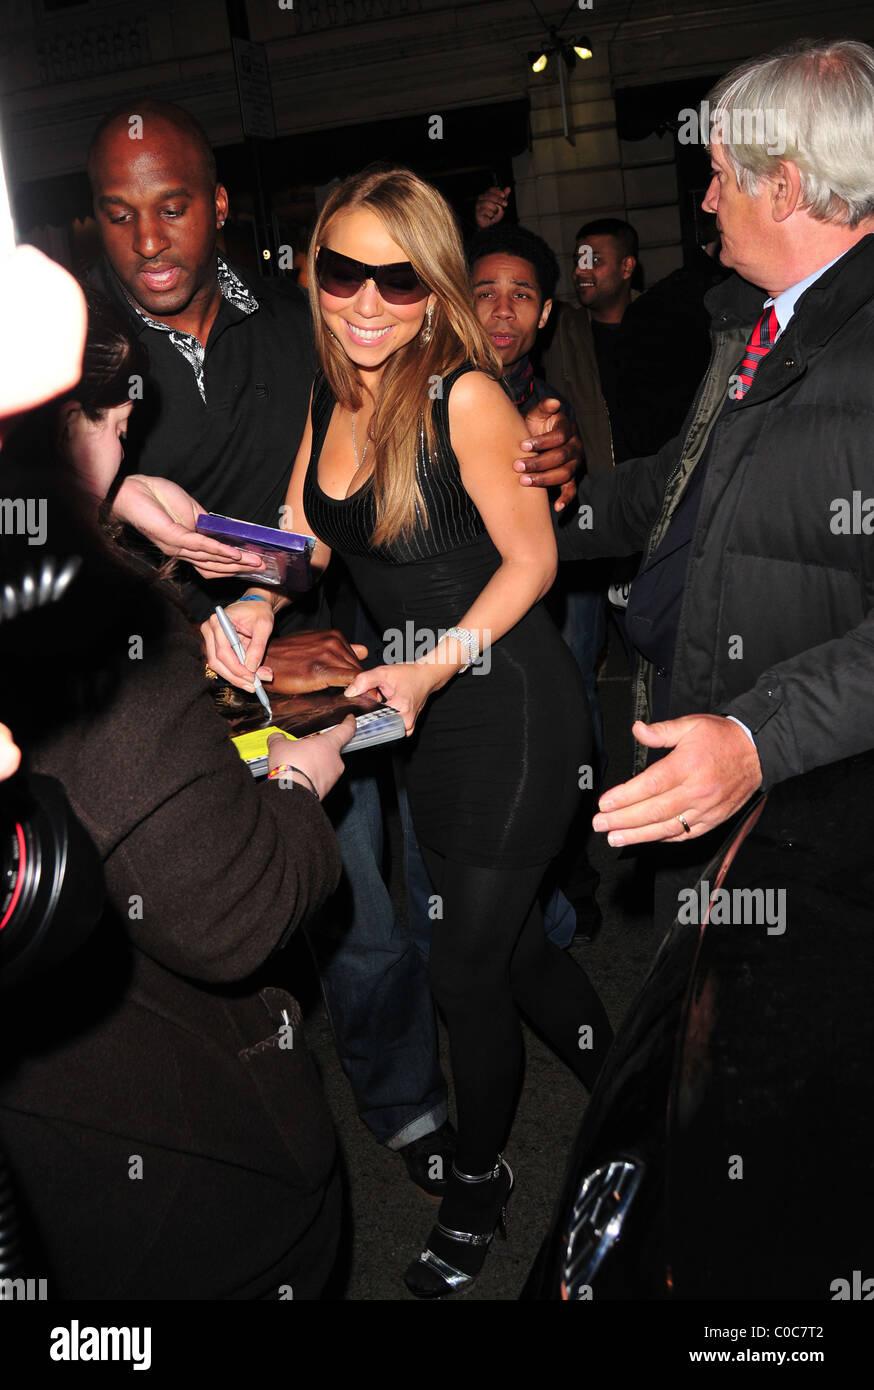 Paparazzi Mariah Carey nudes (29 photo), Pussy